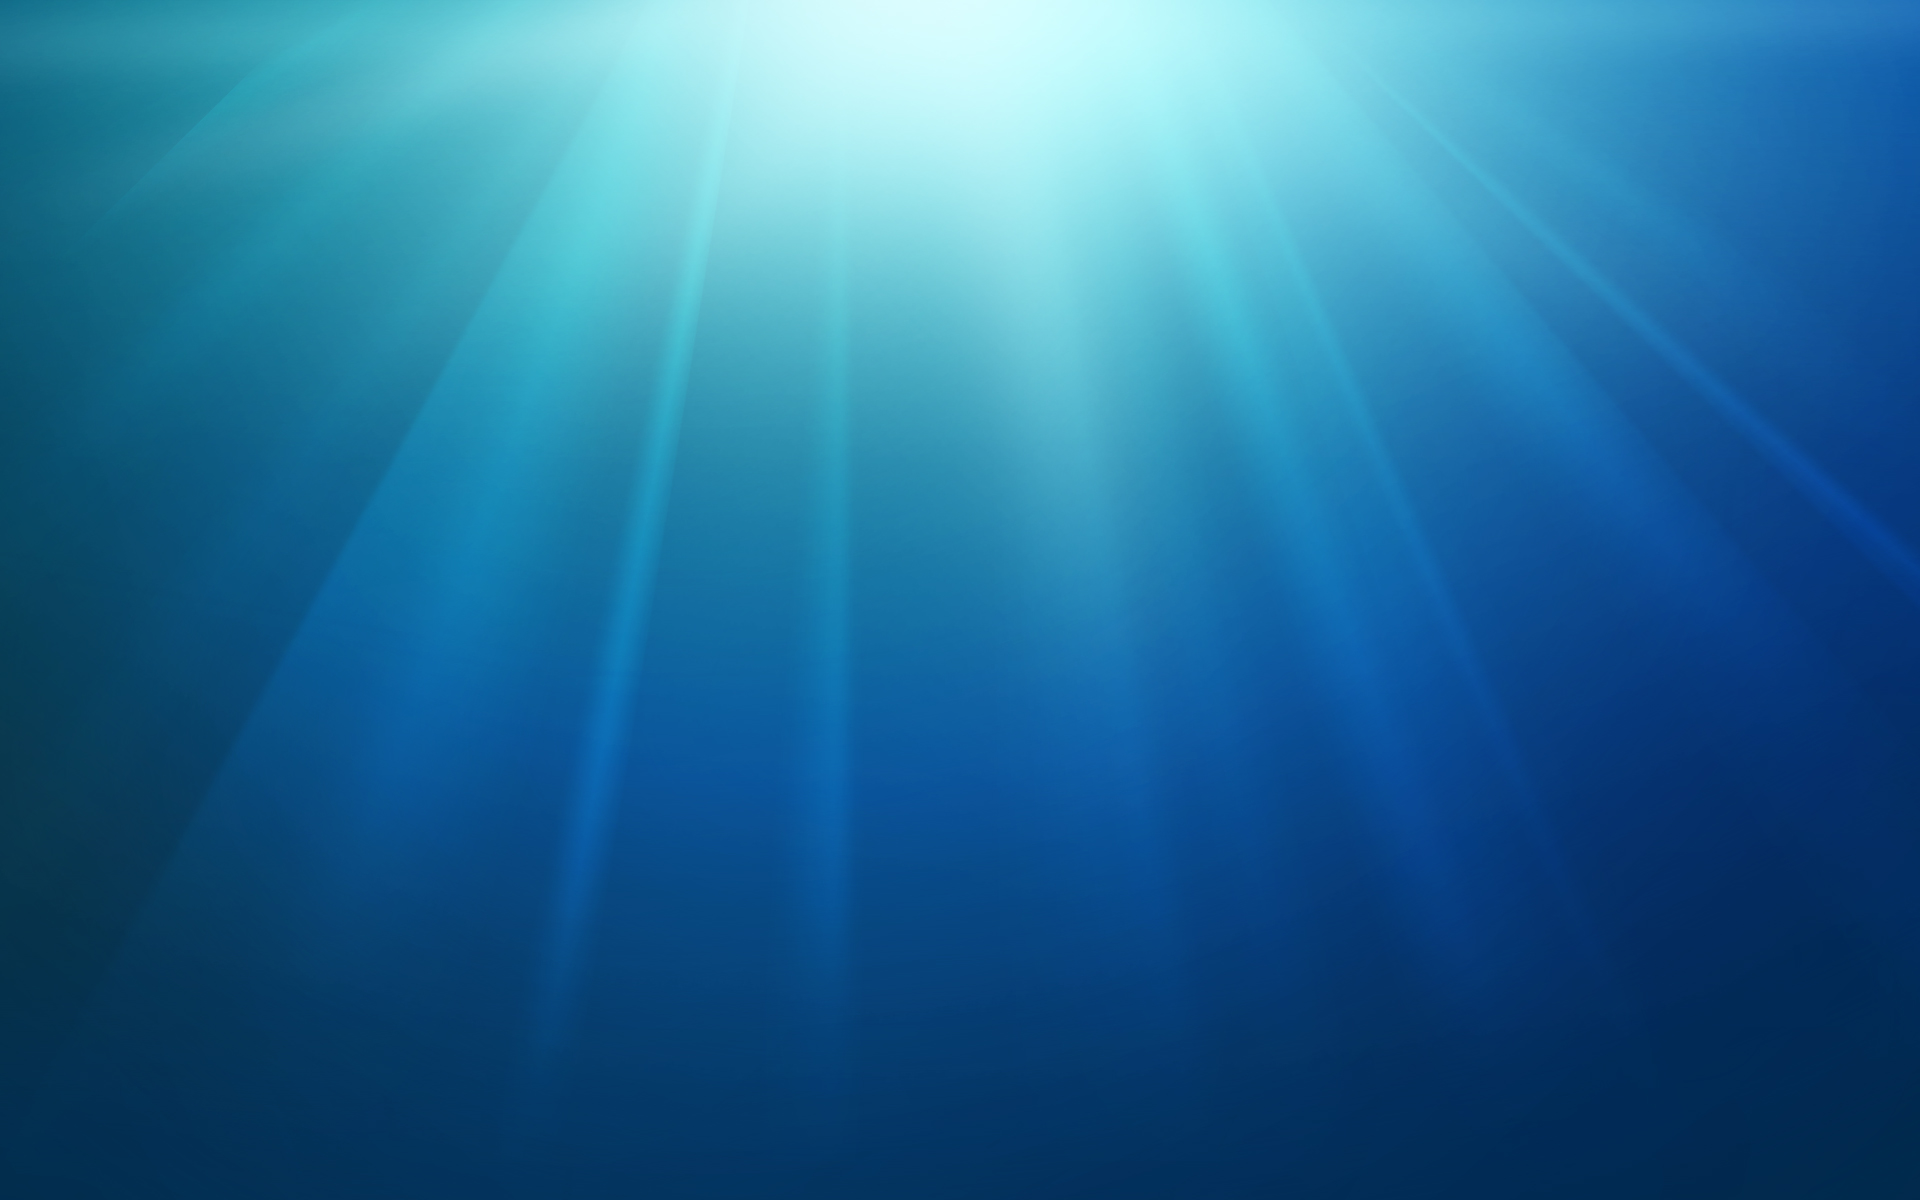 Underwater Light   Cool Twitter Backgrounds 1920x1200